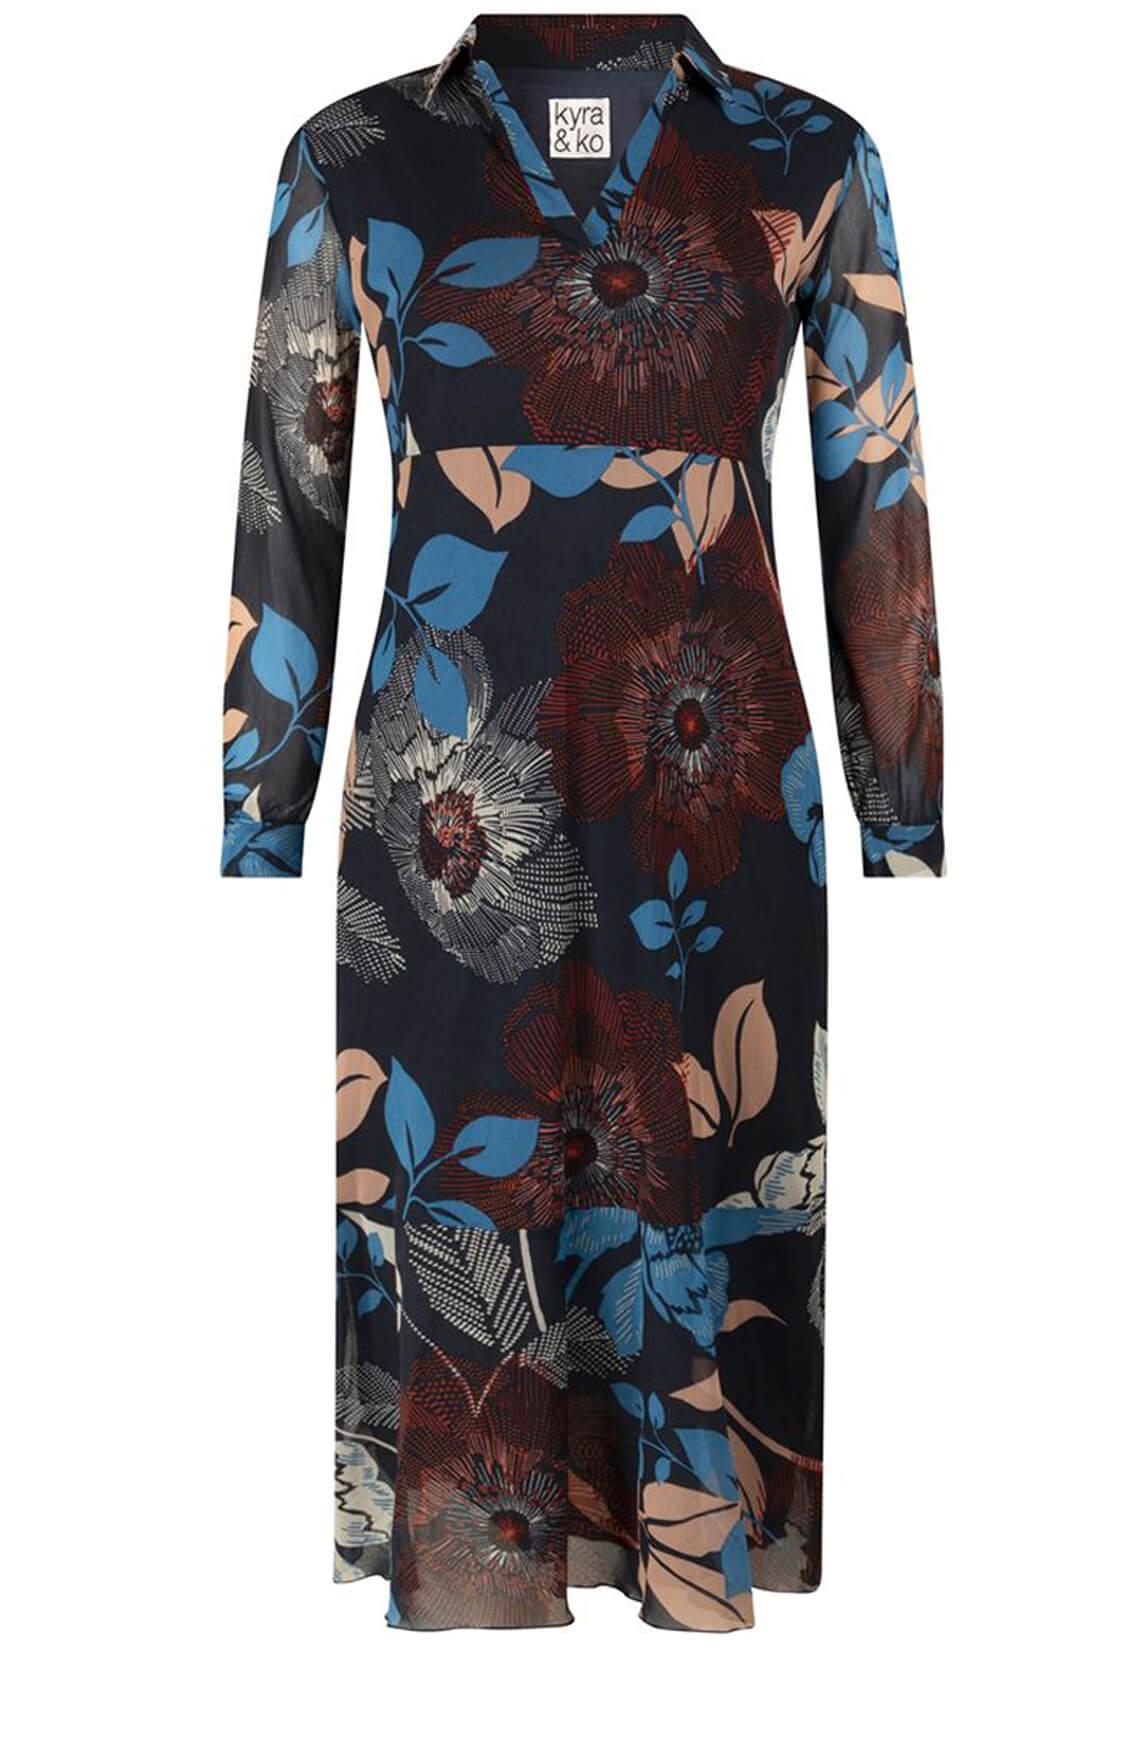 Kyra & Ko Dames Crisanne jurk Blauw